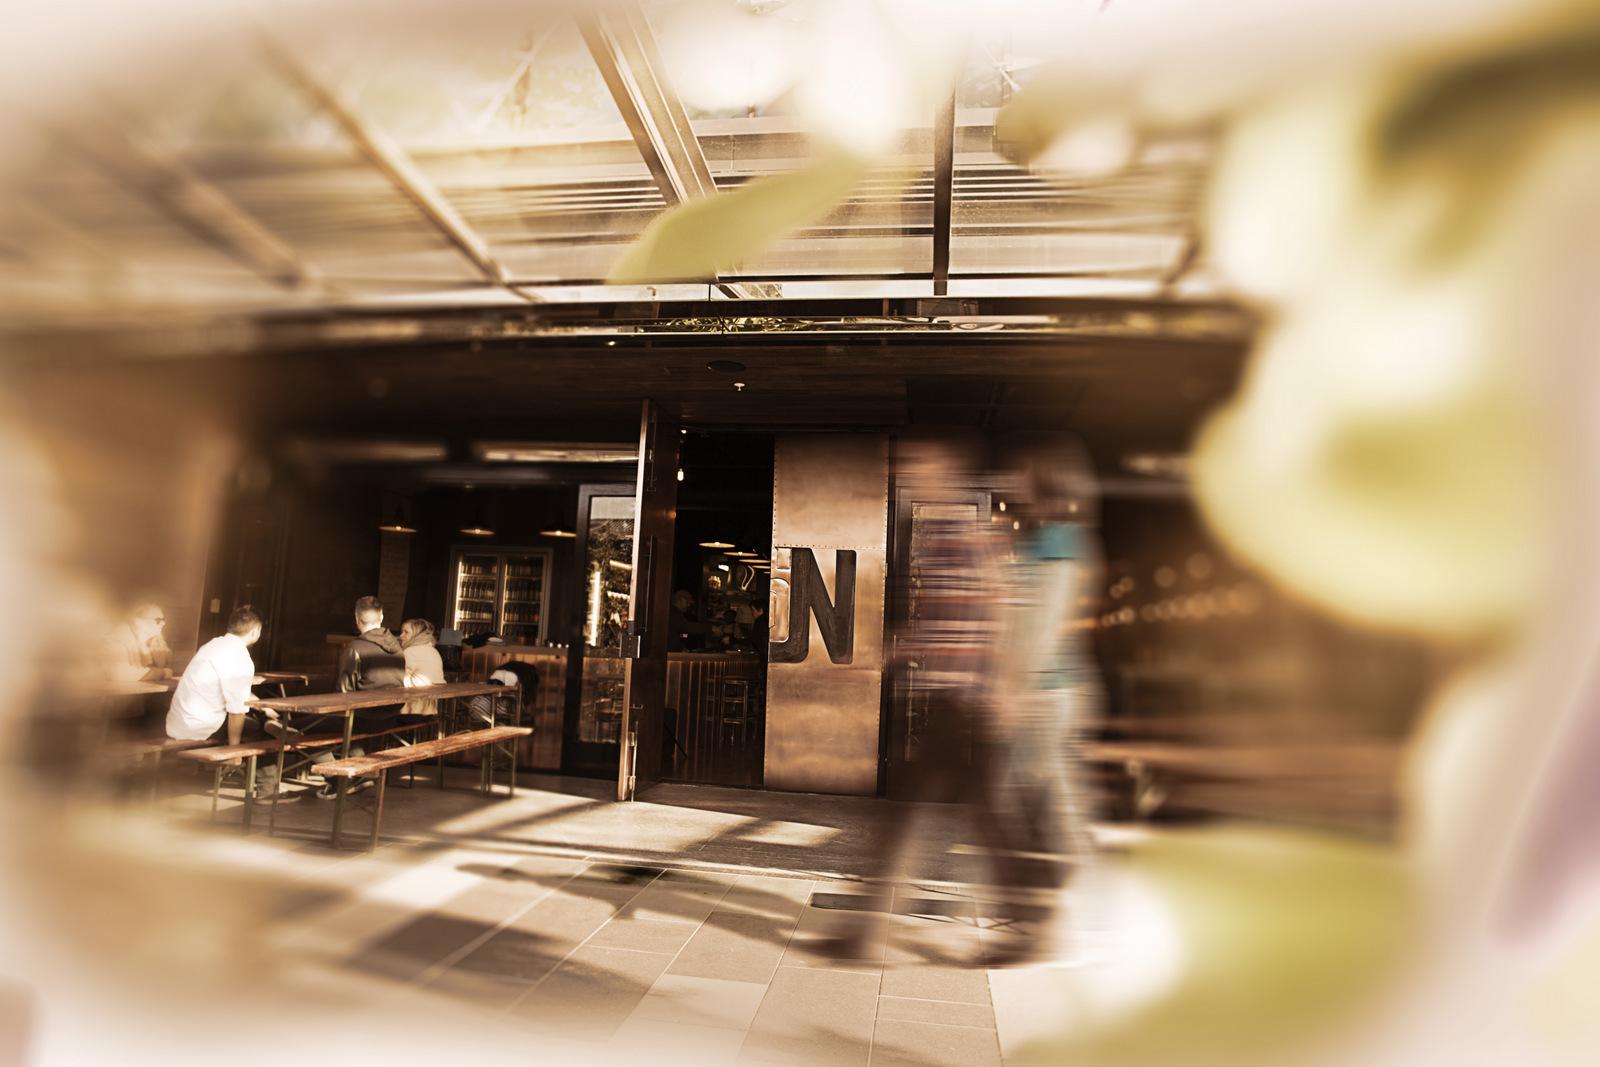 Sixteen TUN – Craft Beer Bar in Auckland